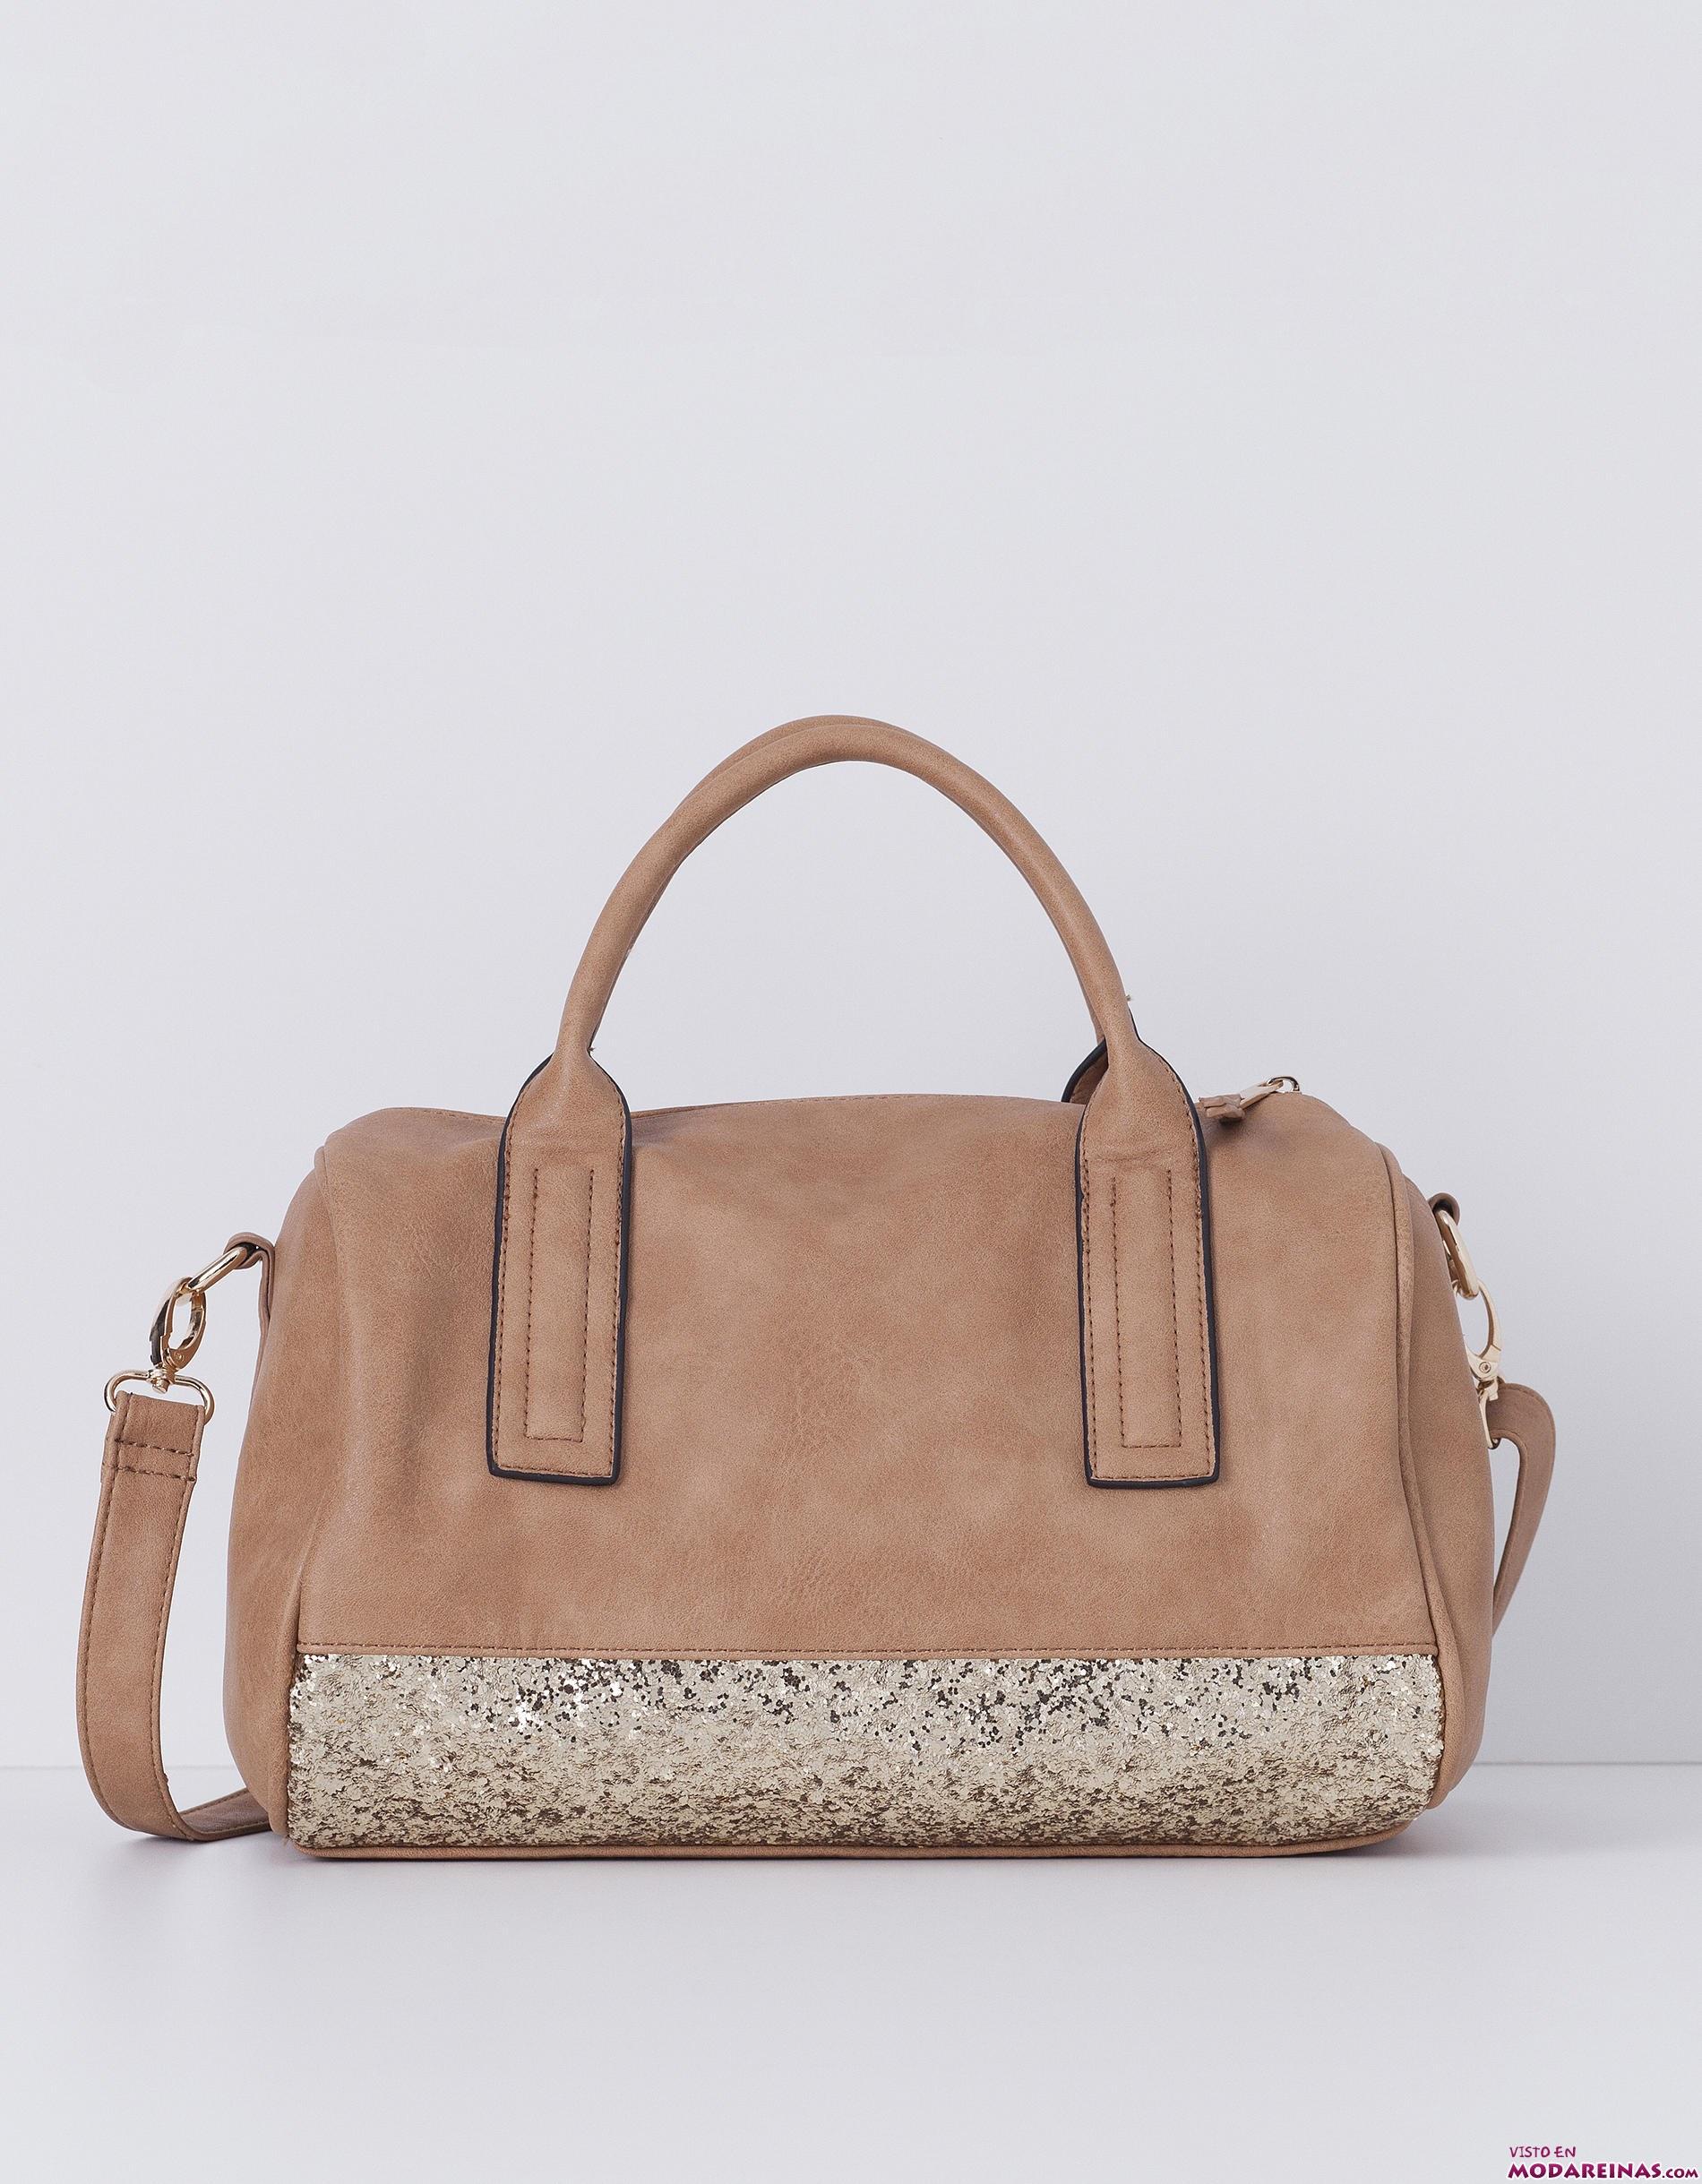 bolsos marrón de Blanco con glitter